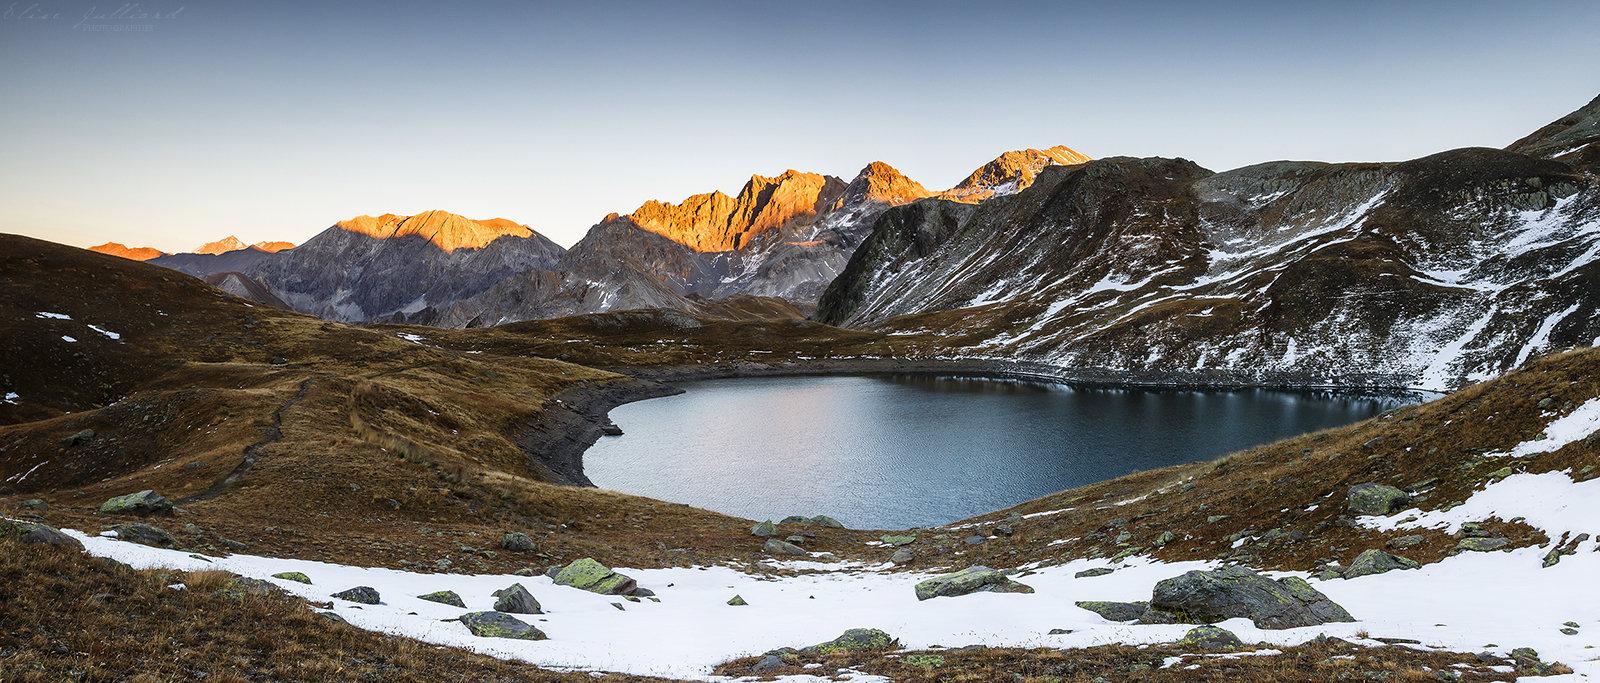 elise-julliard-photographe-photo-paysage-panorama-lacs-sainte-marguerite-thabor-savoie-maurienne